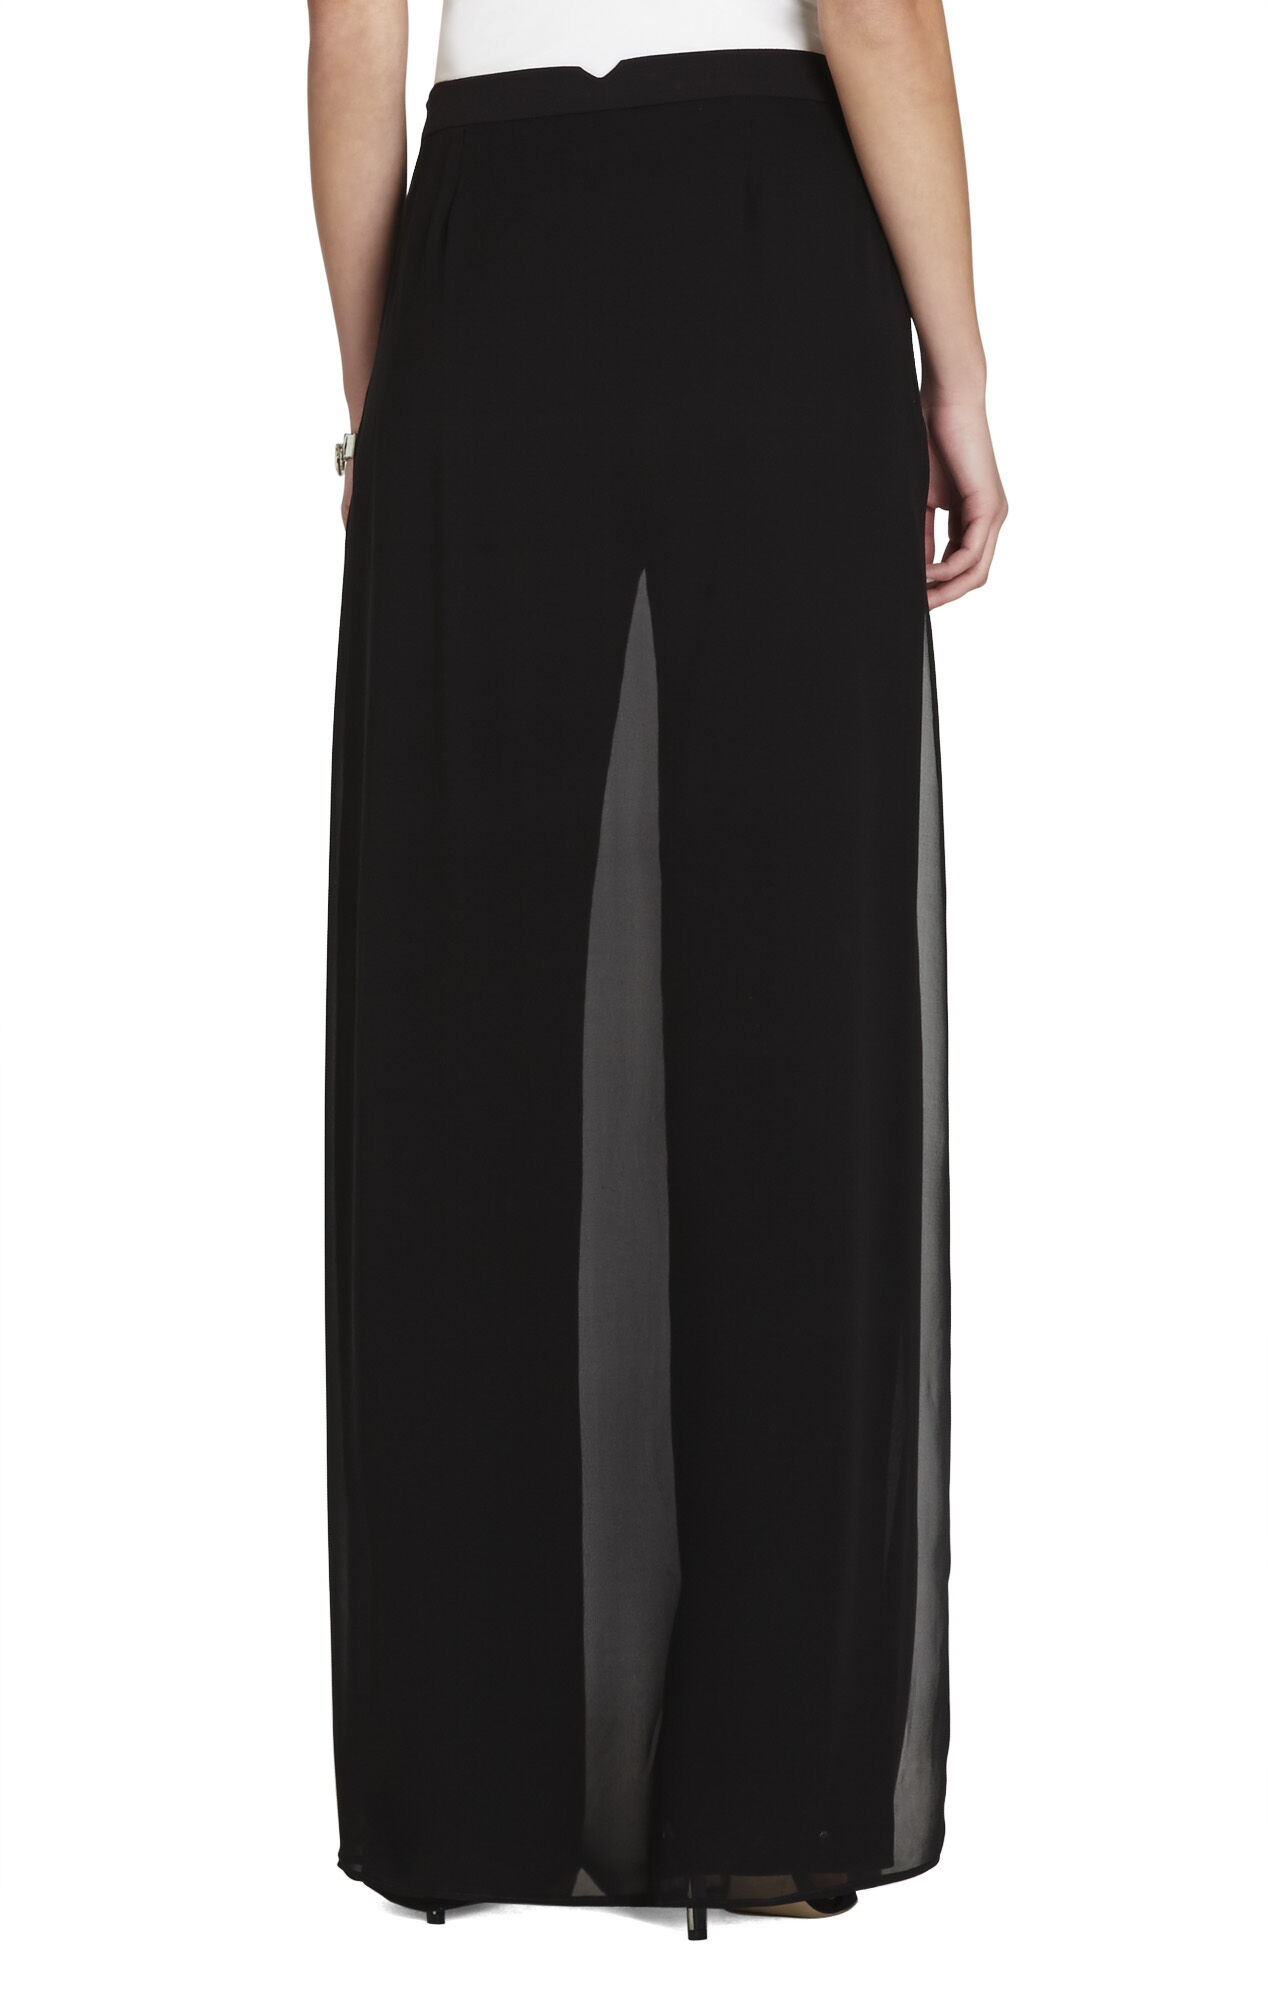 Seth Long Skirt